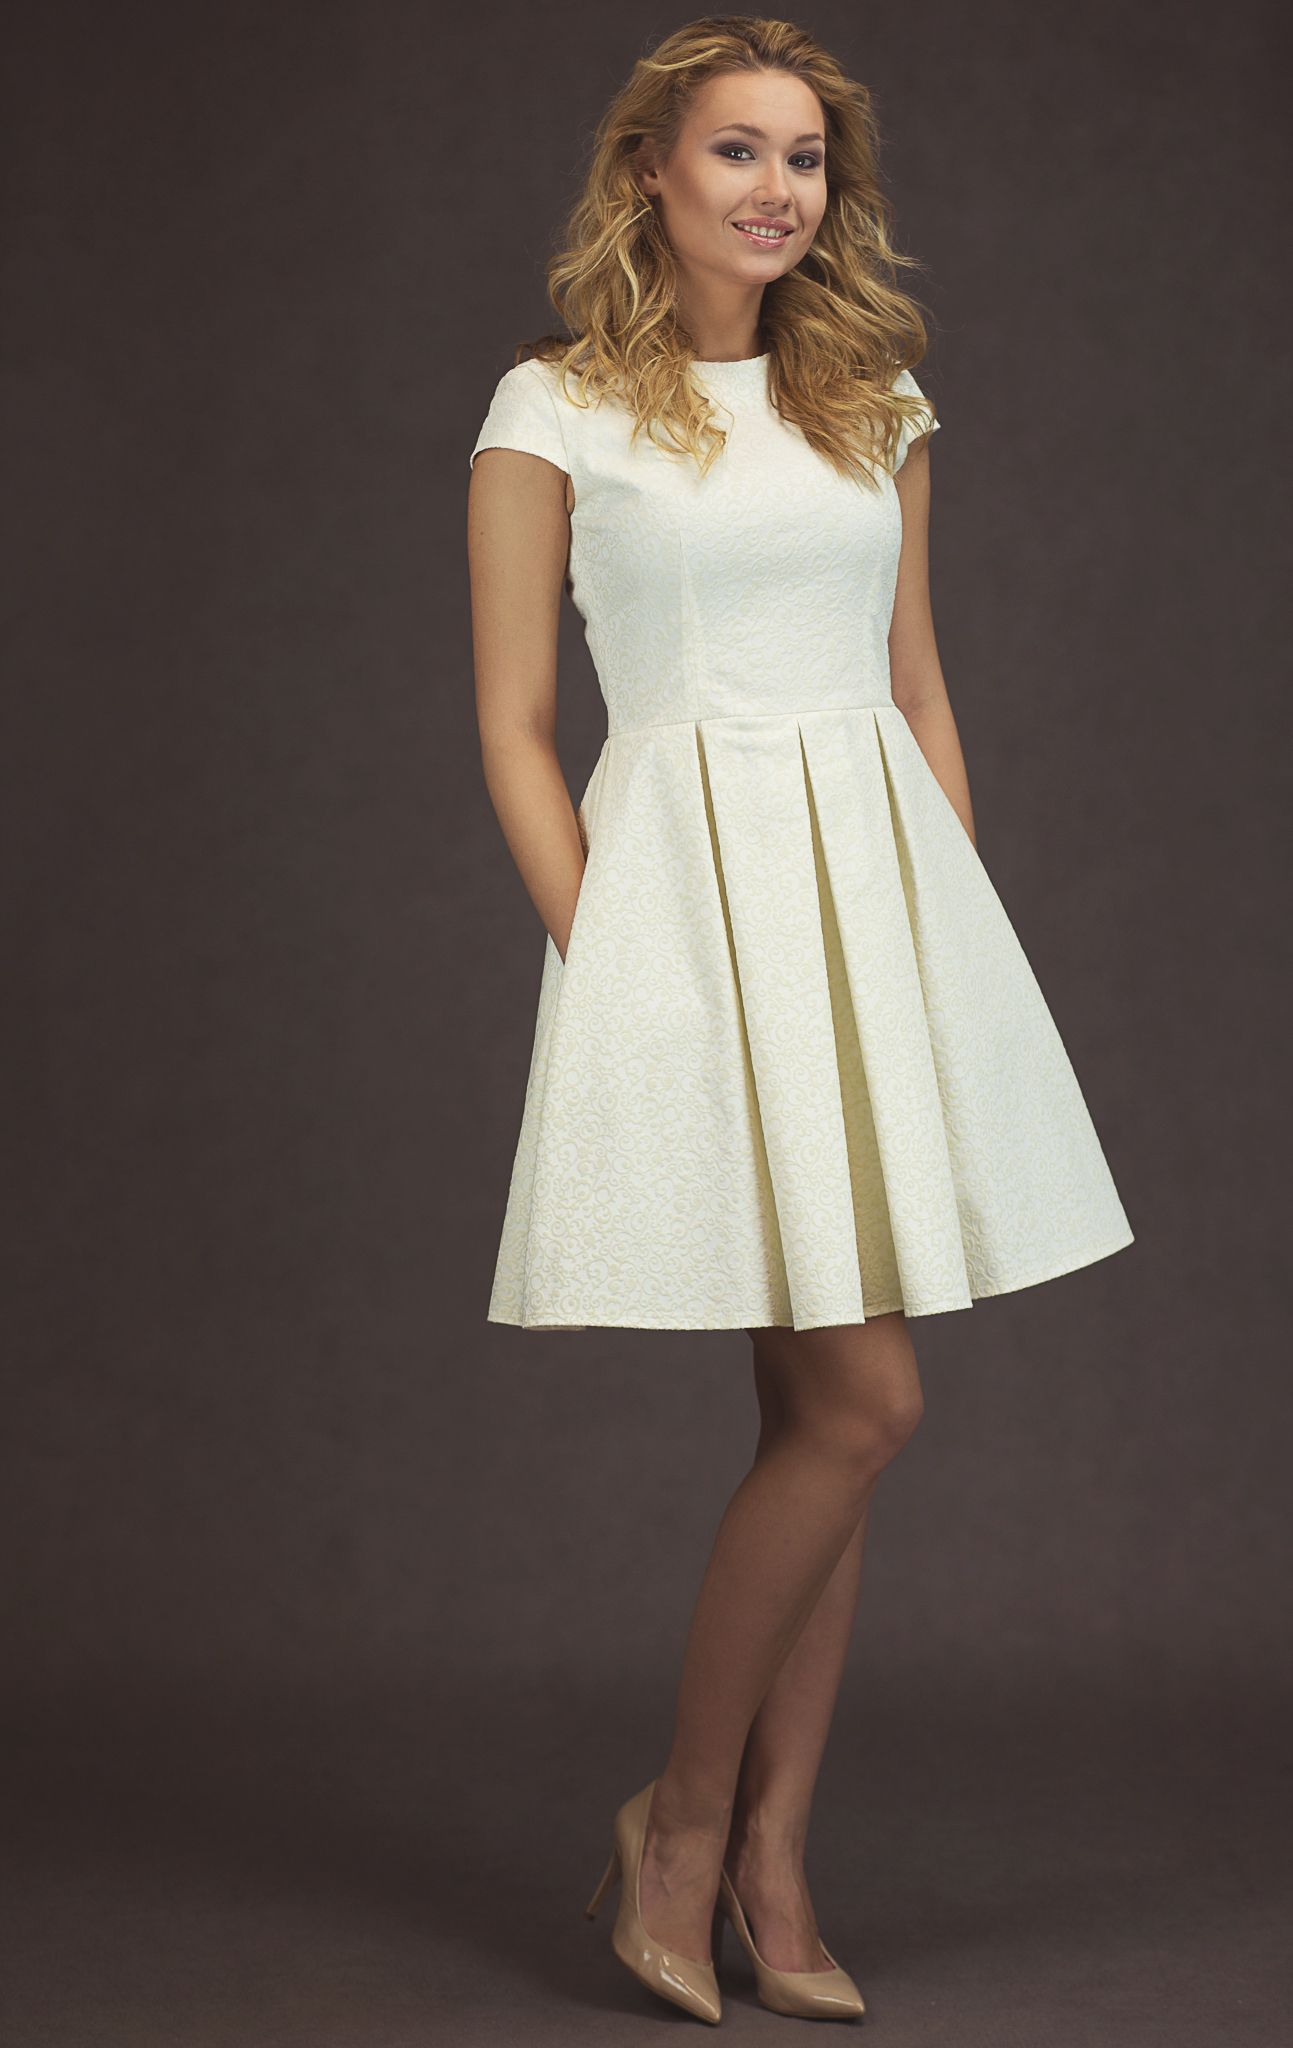 Moosu Milk White Jacquard Dress Designed By La Boutique More About Us